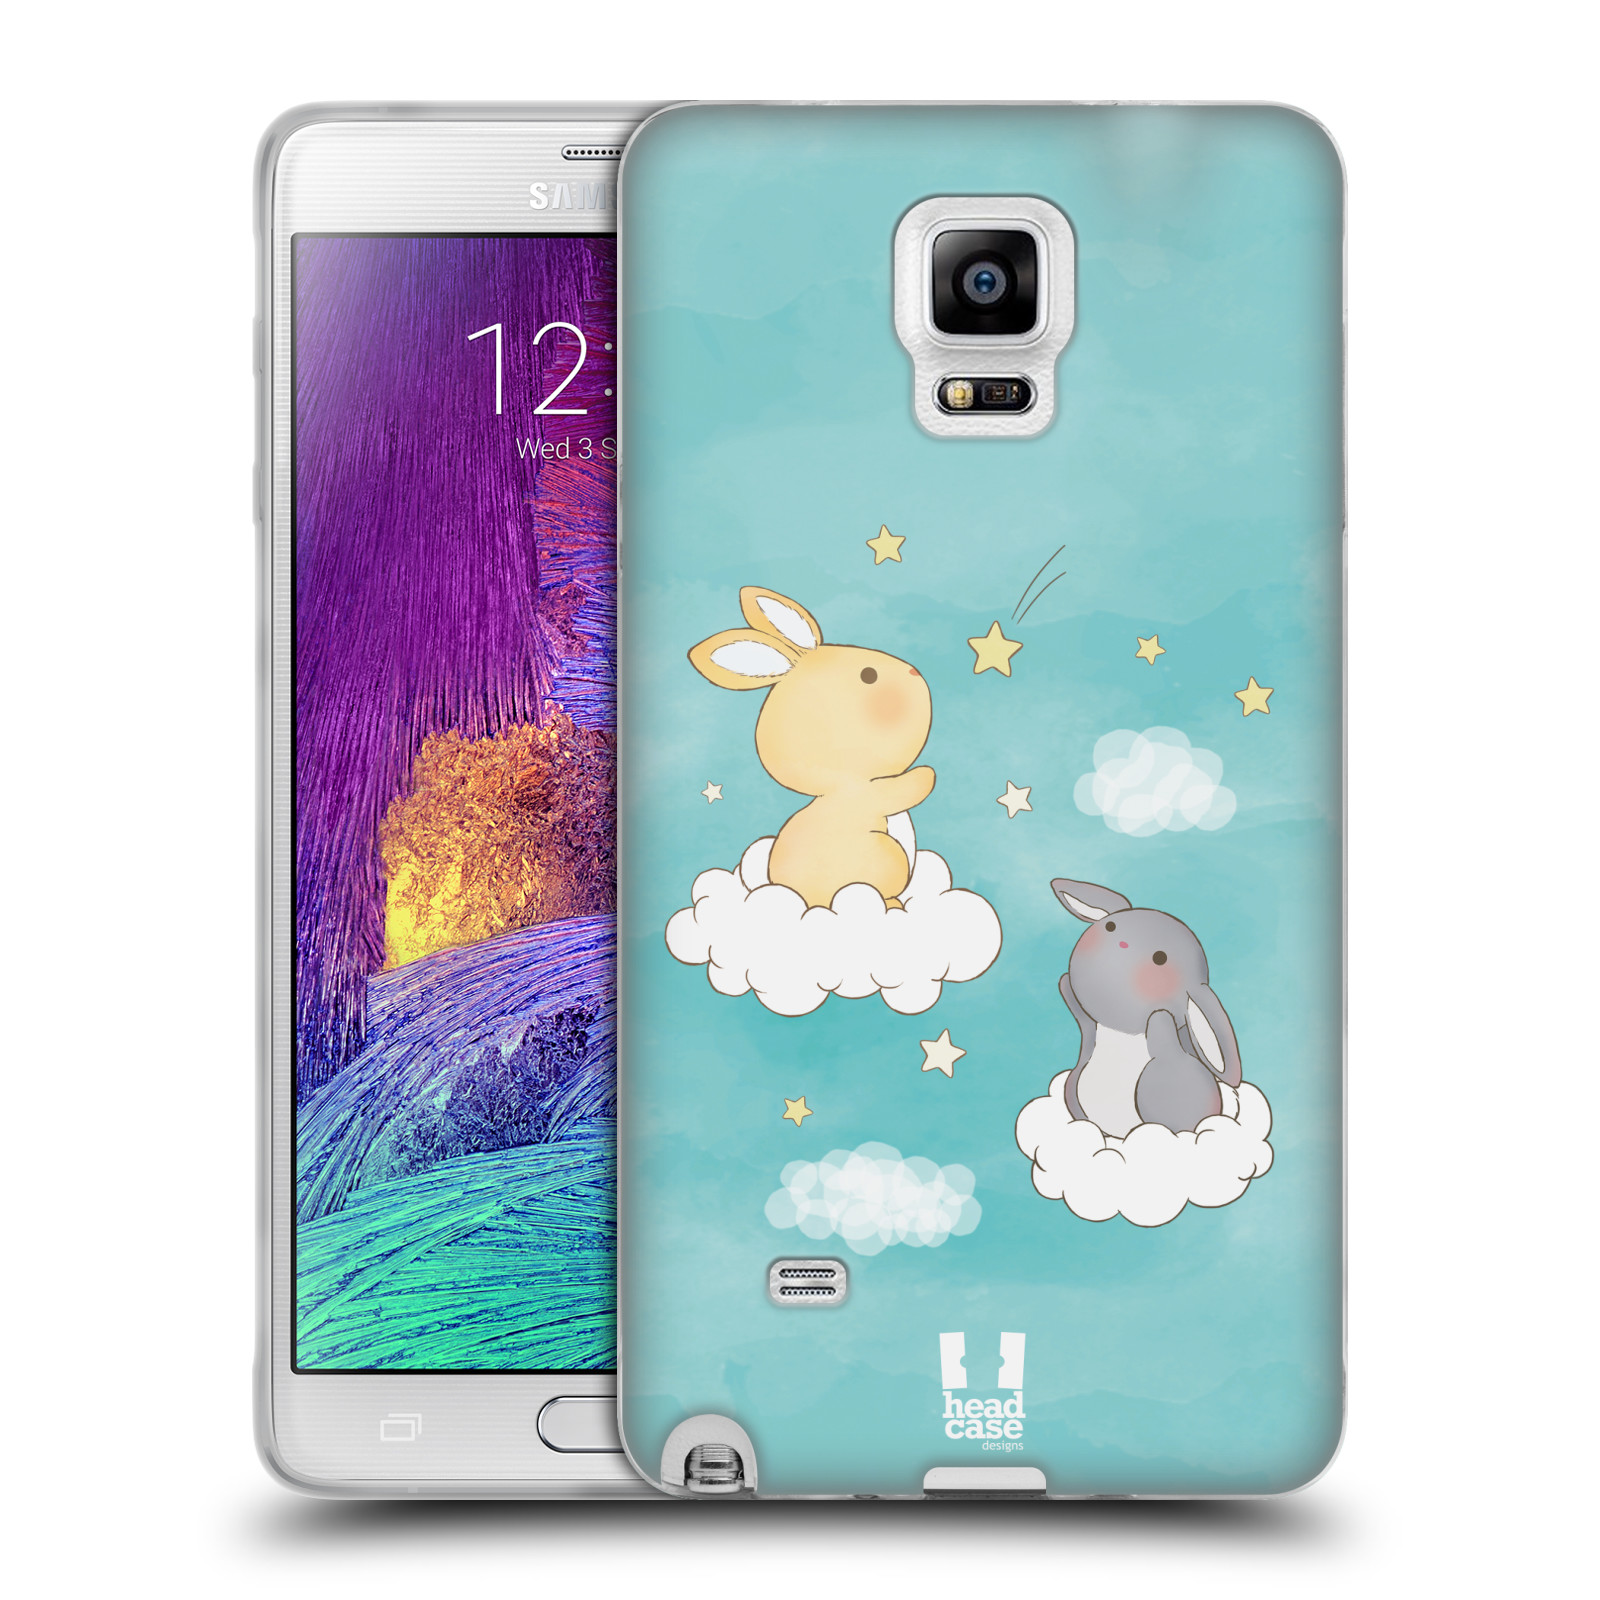 HEAD CASE silikonový obal na mobil Samsung Galaxy Note 4 (N910) vzor králíček a hvězdy modrá